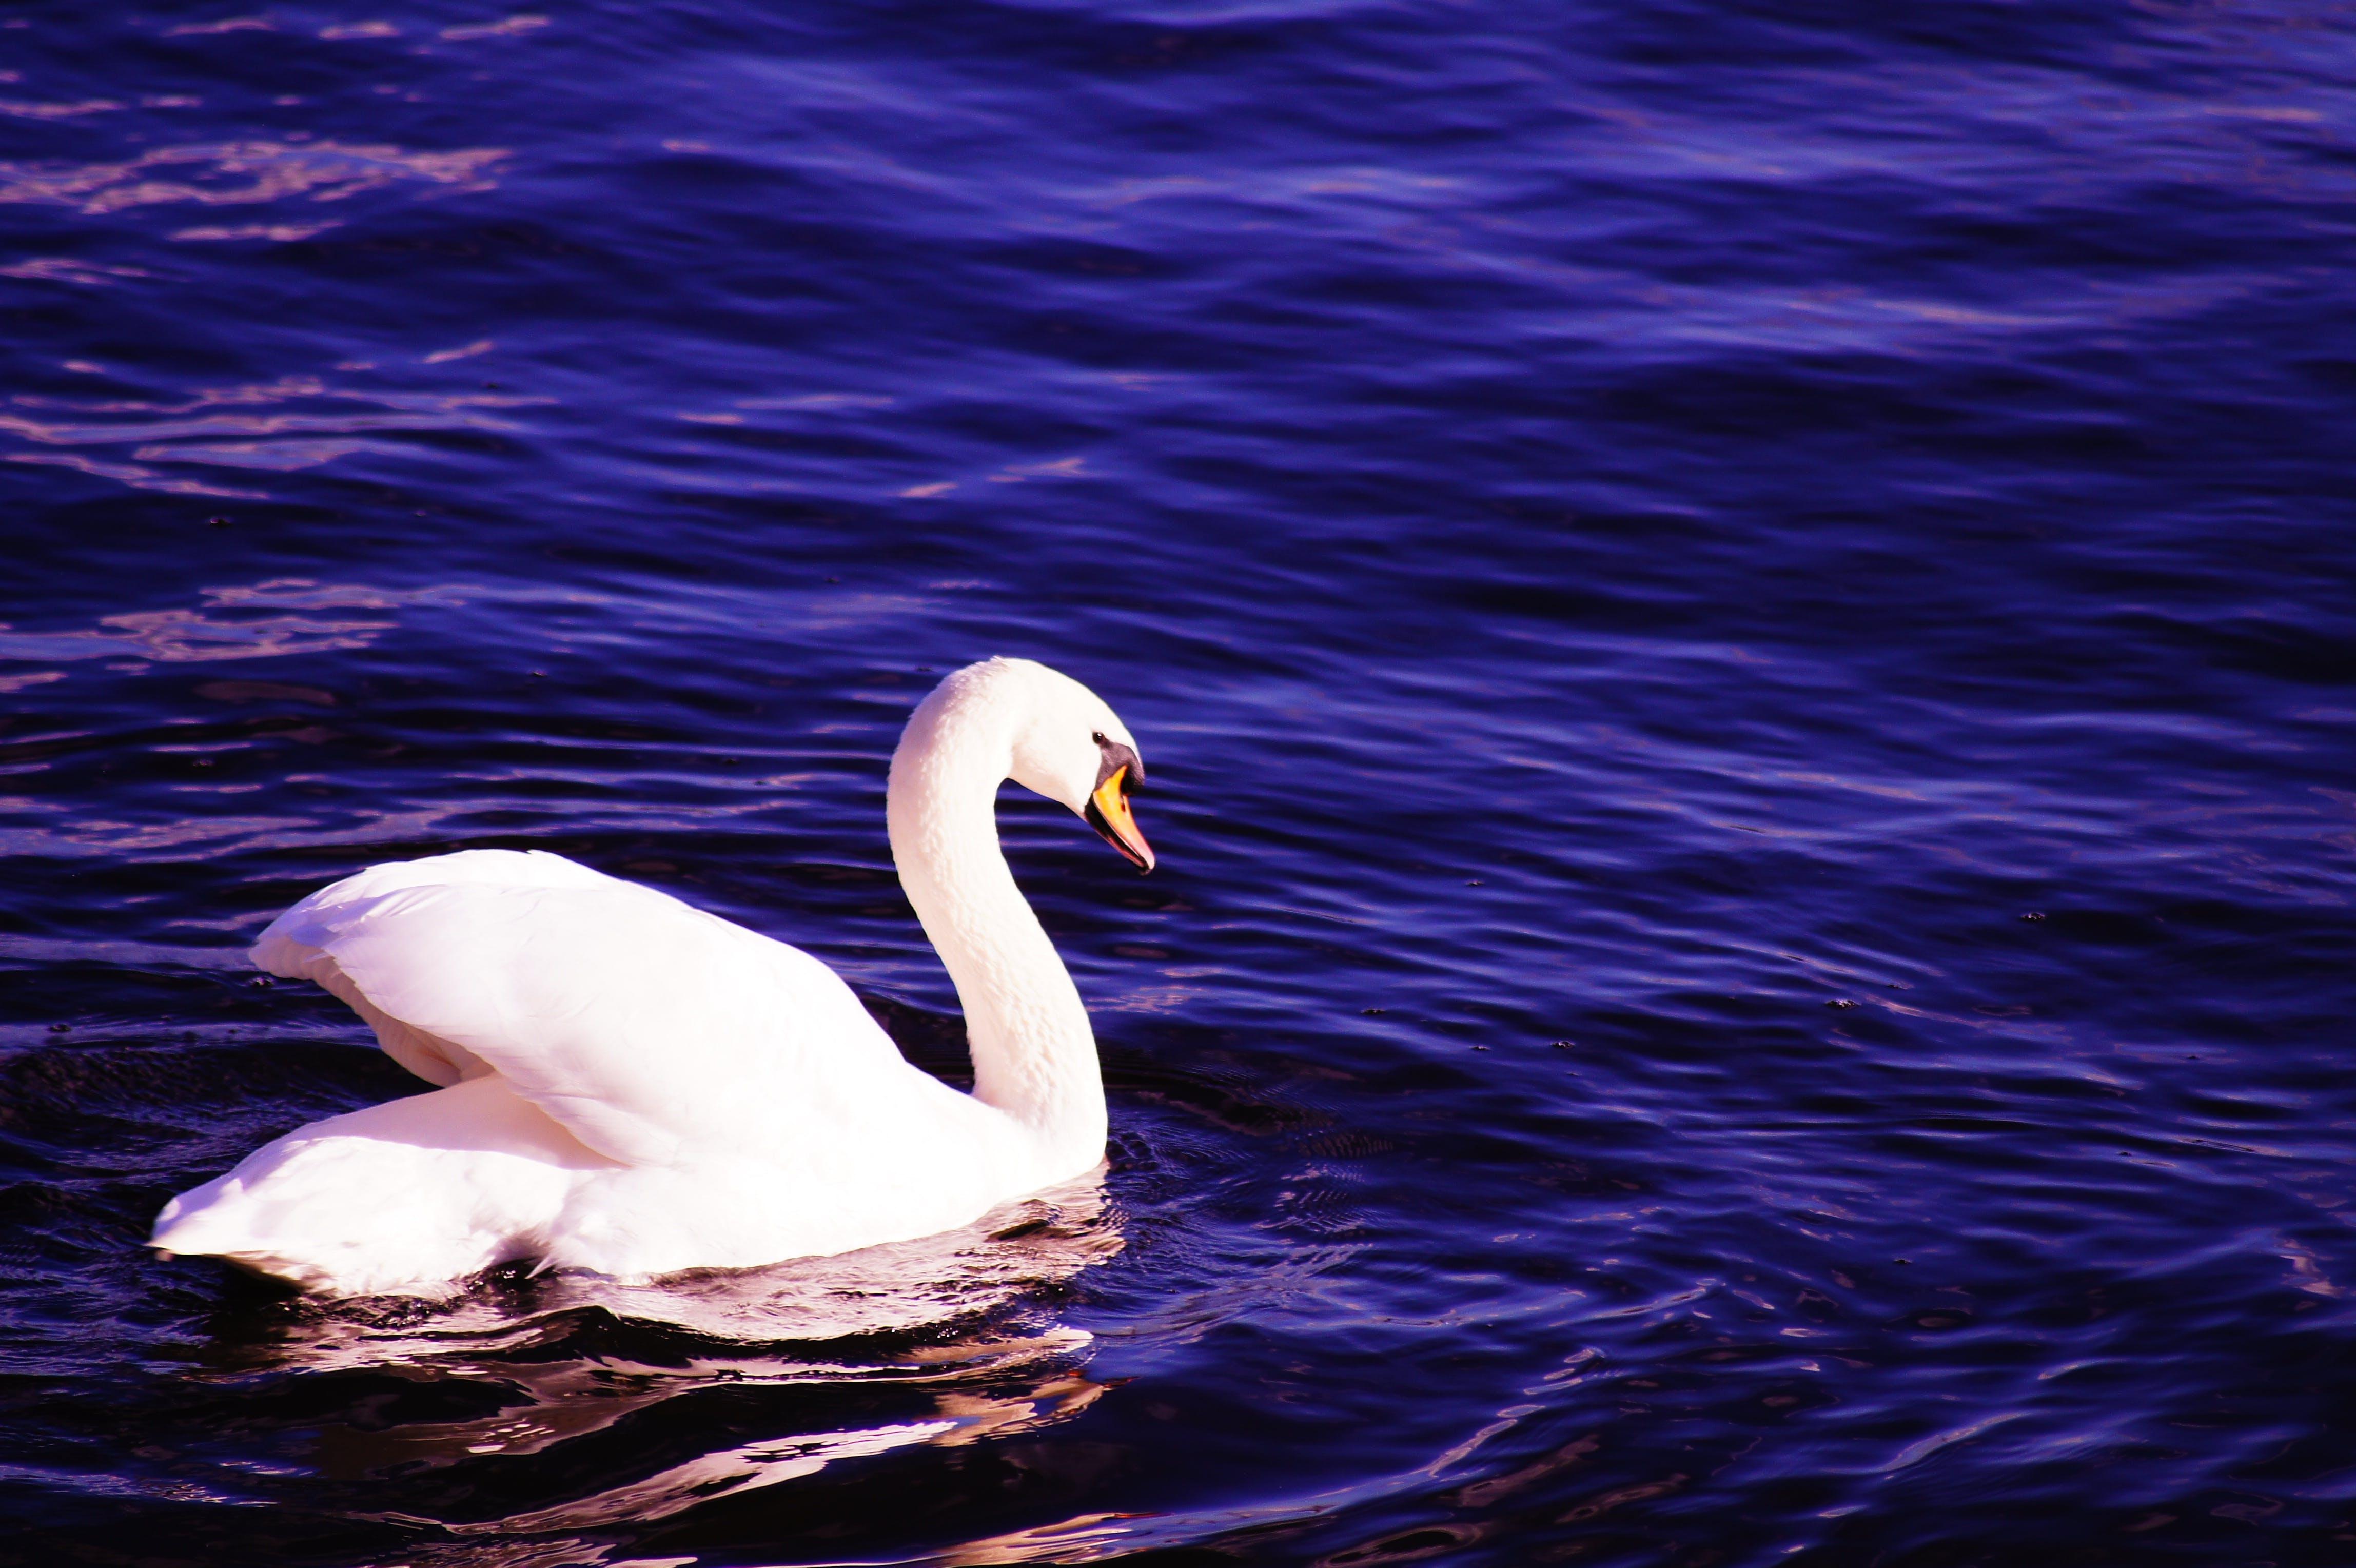 Free stock photo of nature, bird, water, wave